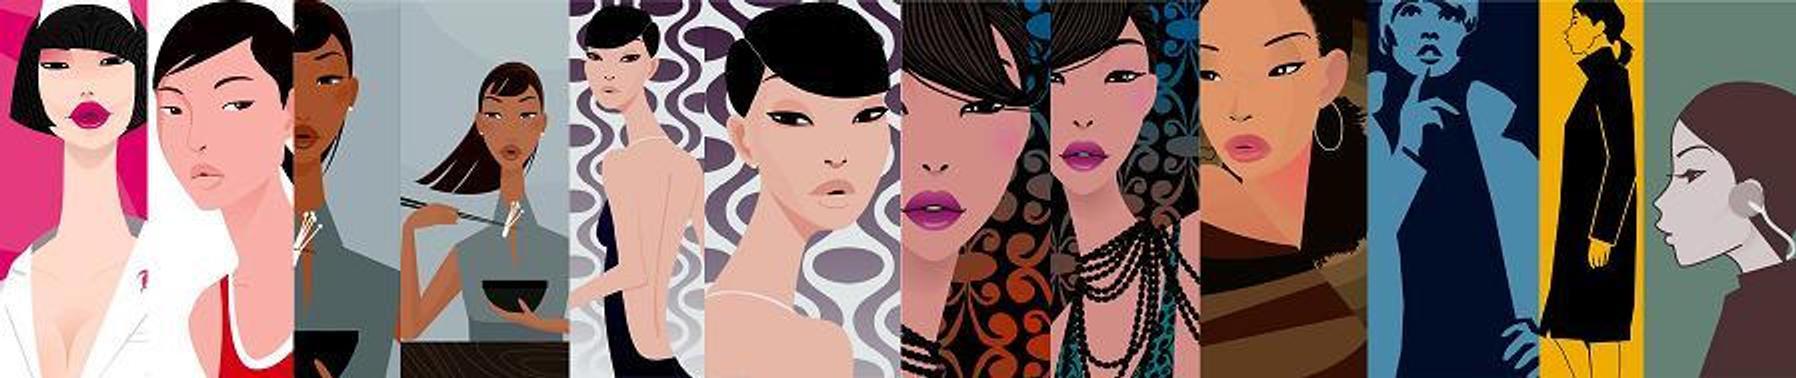 girls by mokoo